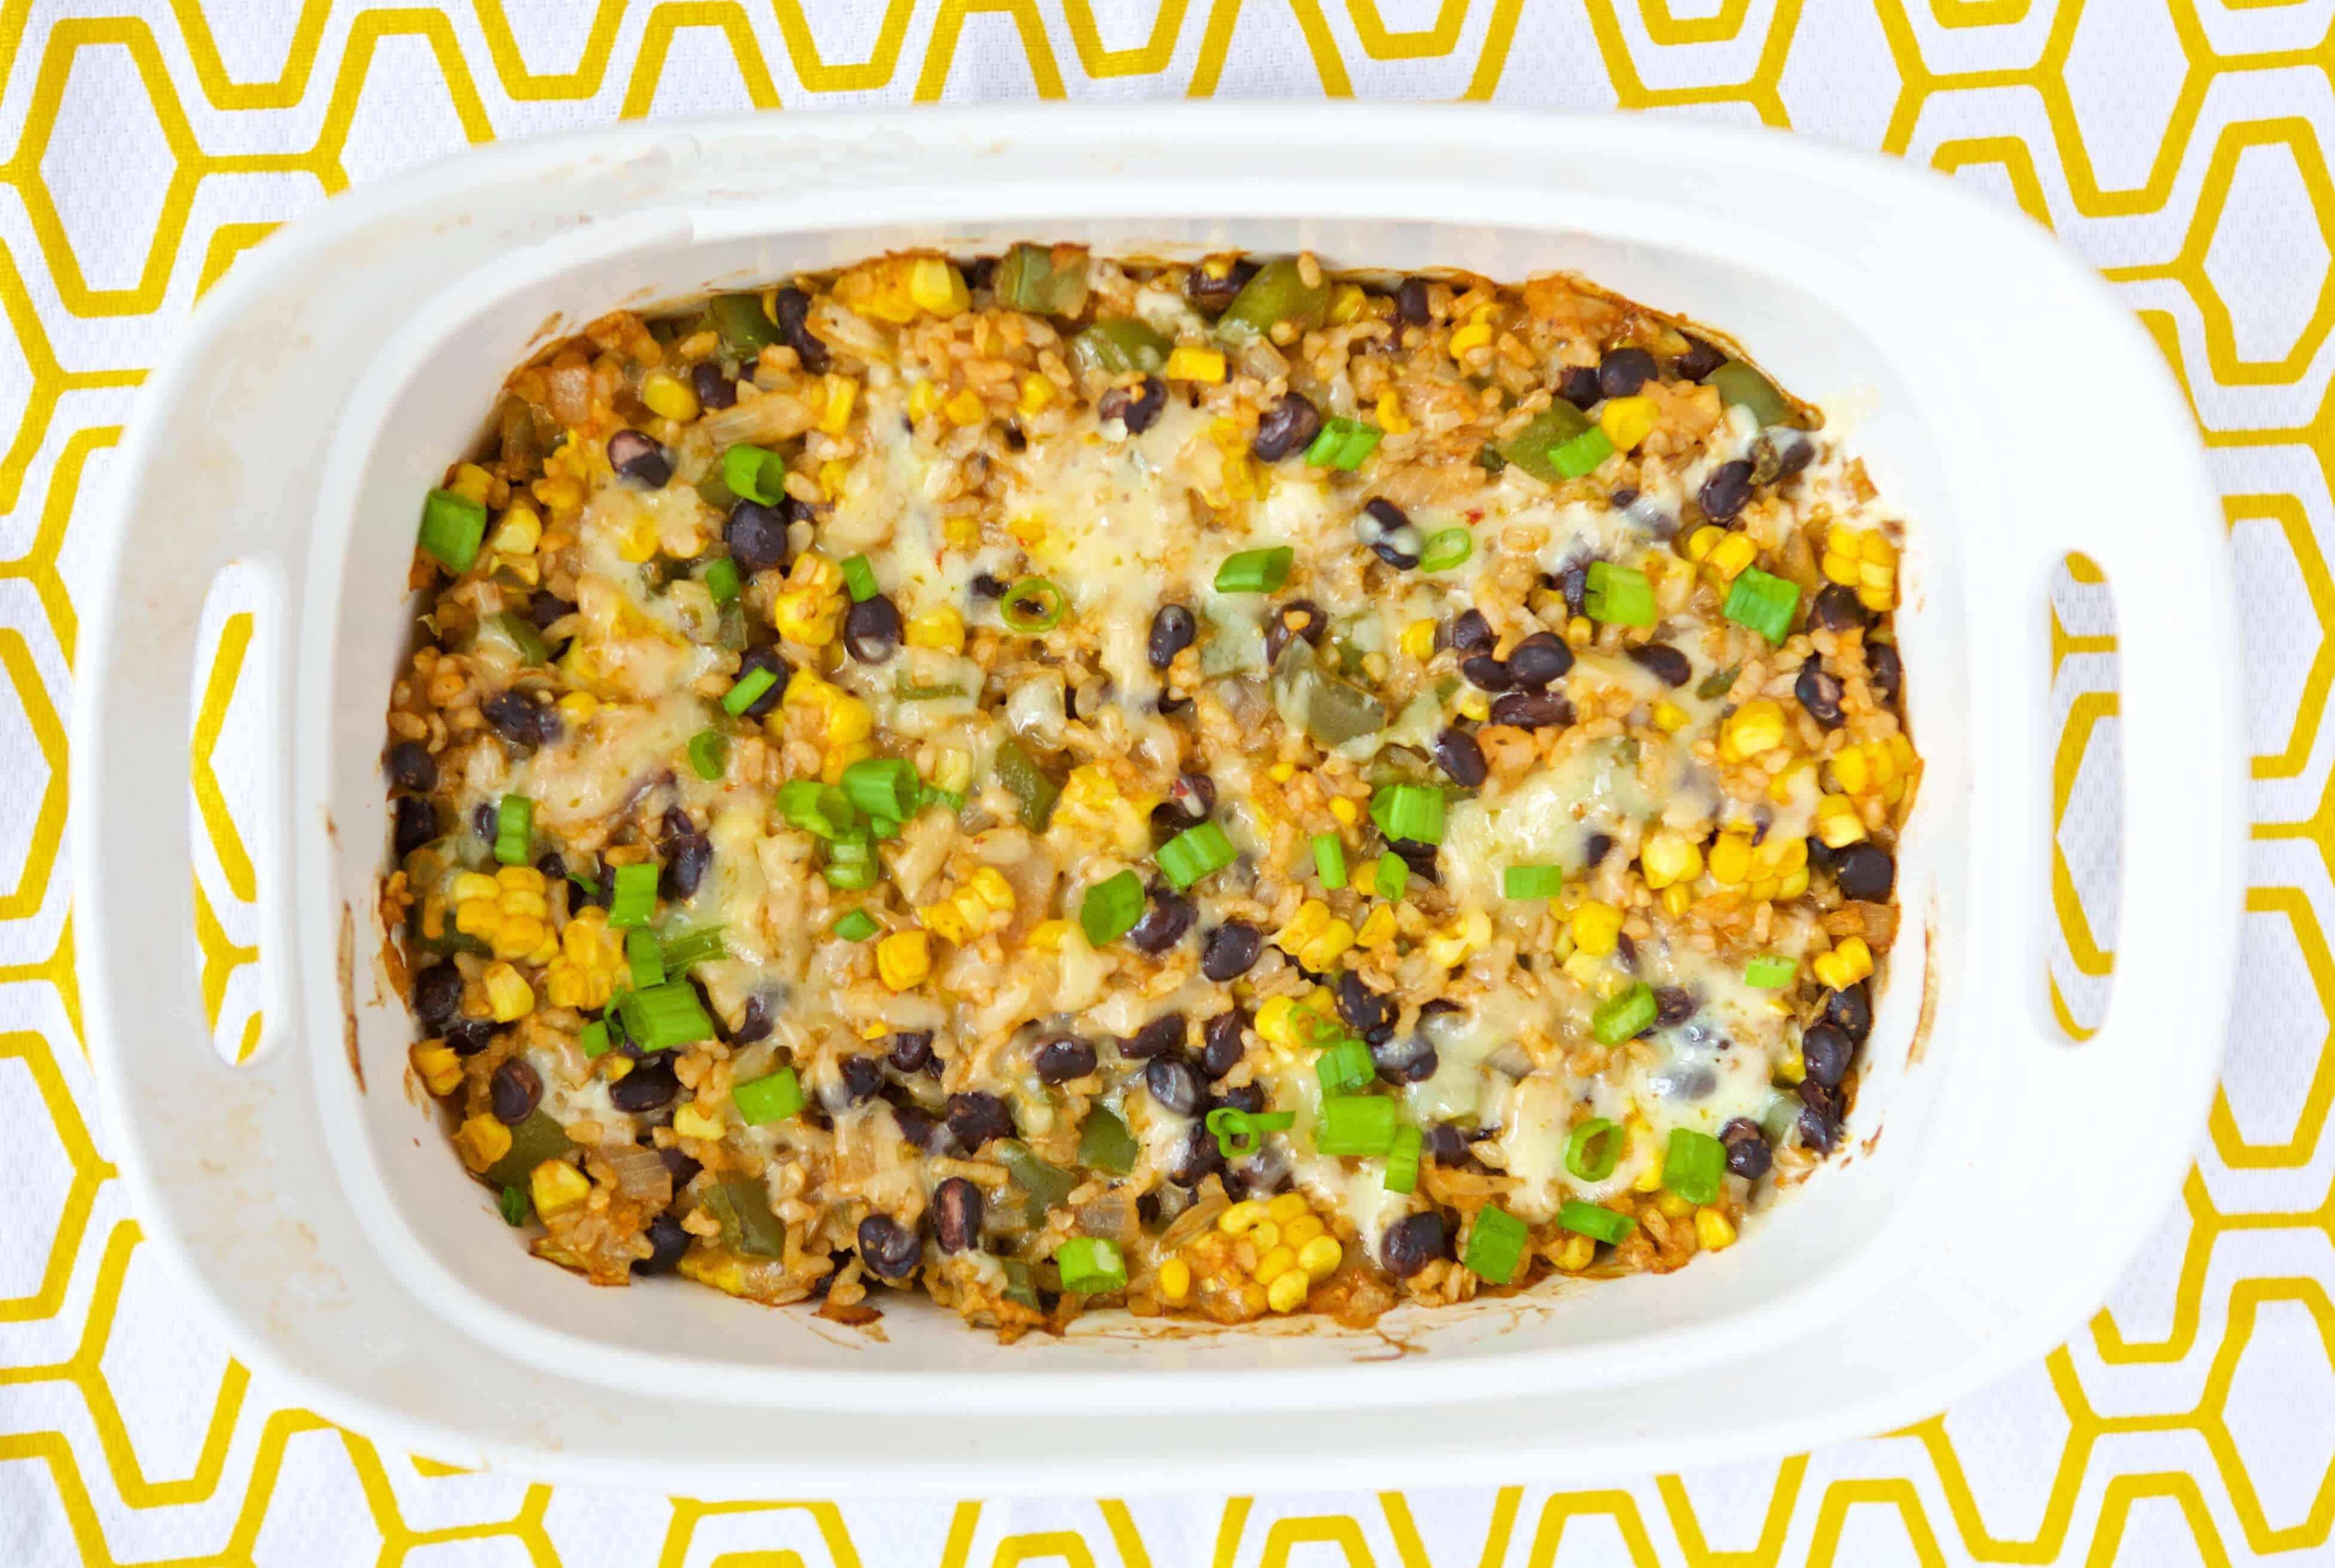 Vegetarian Rice and Bean Casserole overhead